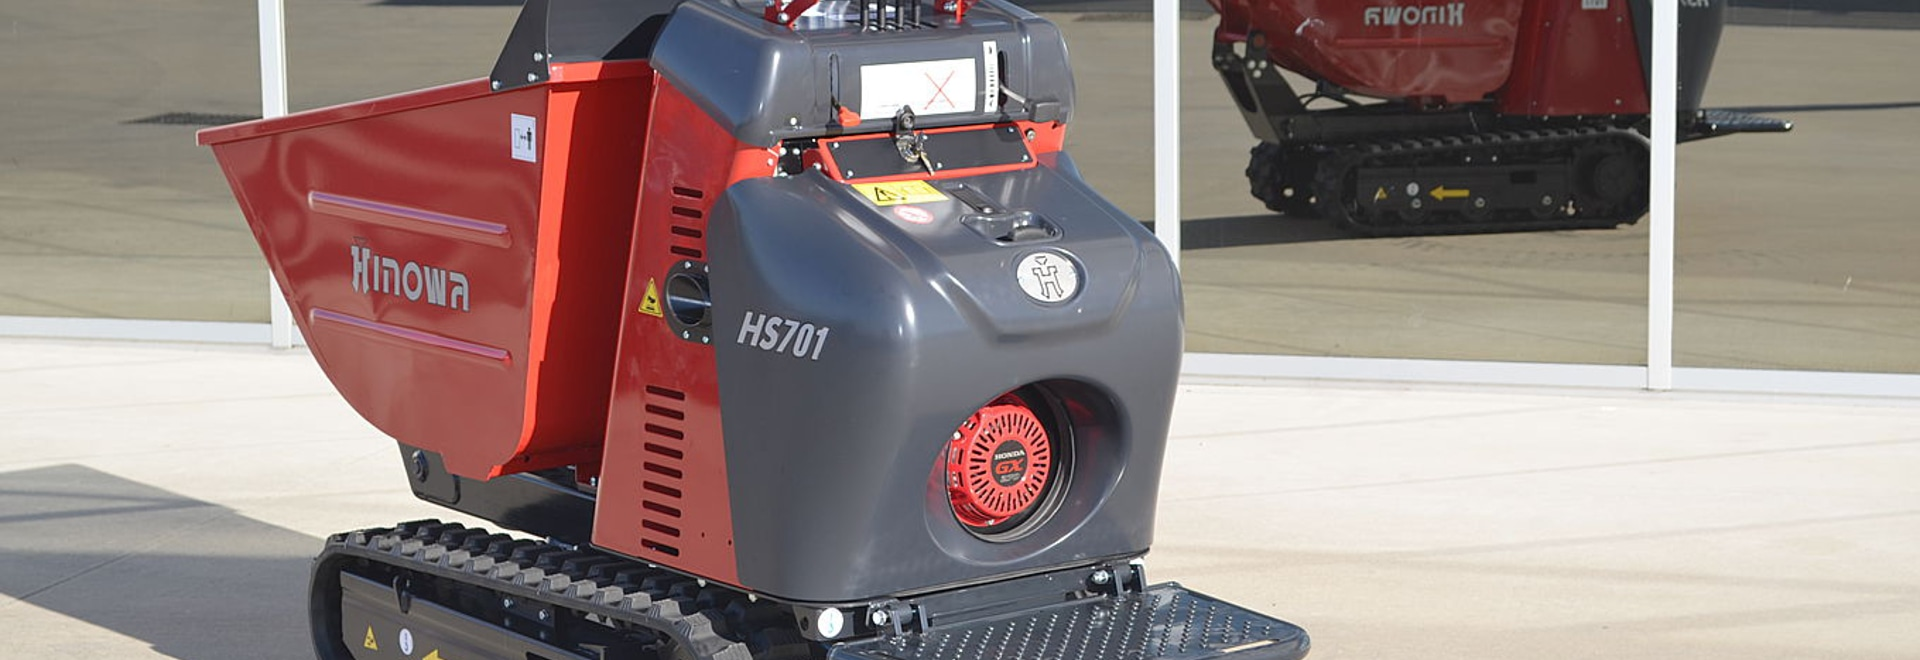 Minidumper HS701 ora anche a benzina